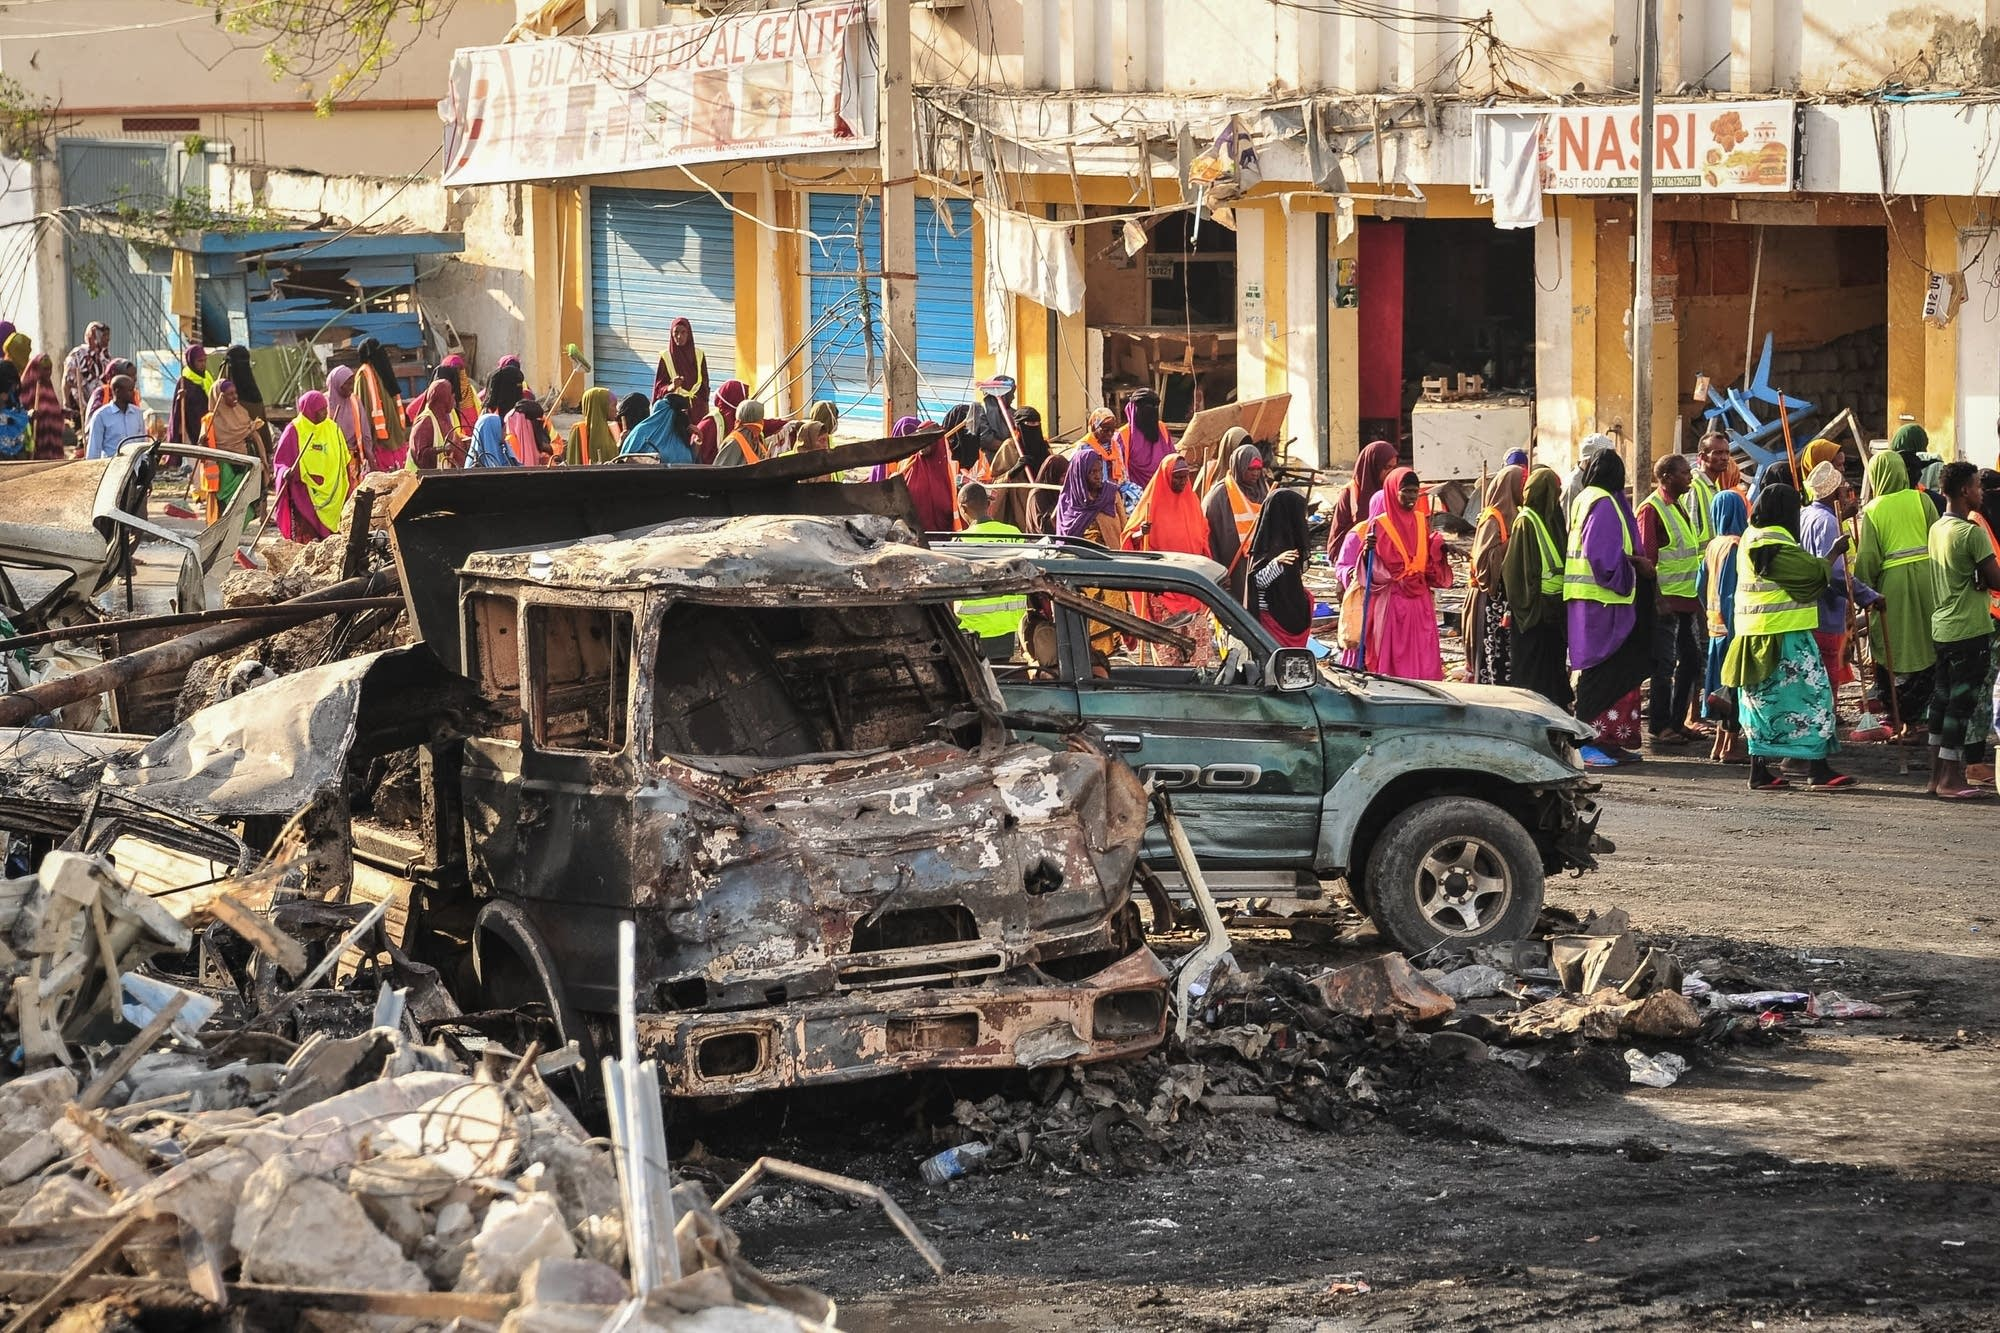 People gather near burned vehicles.